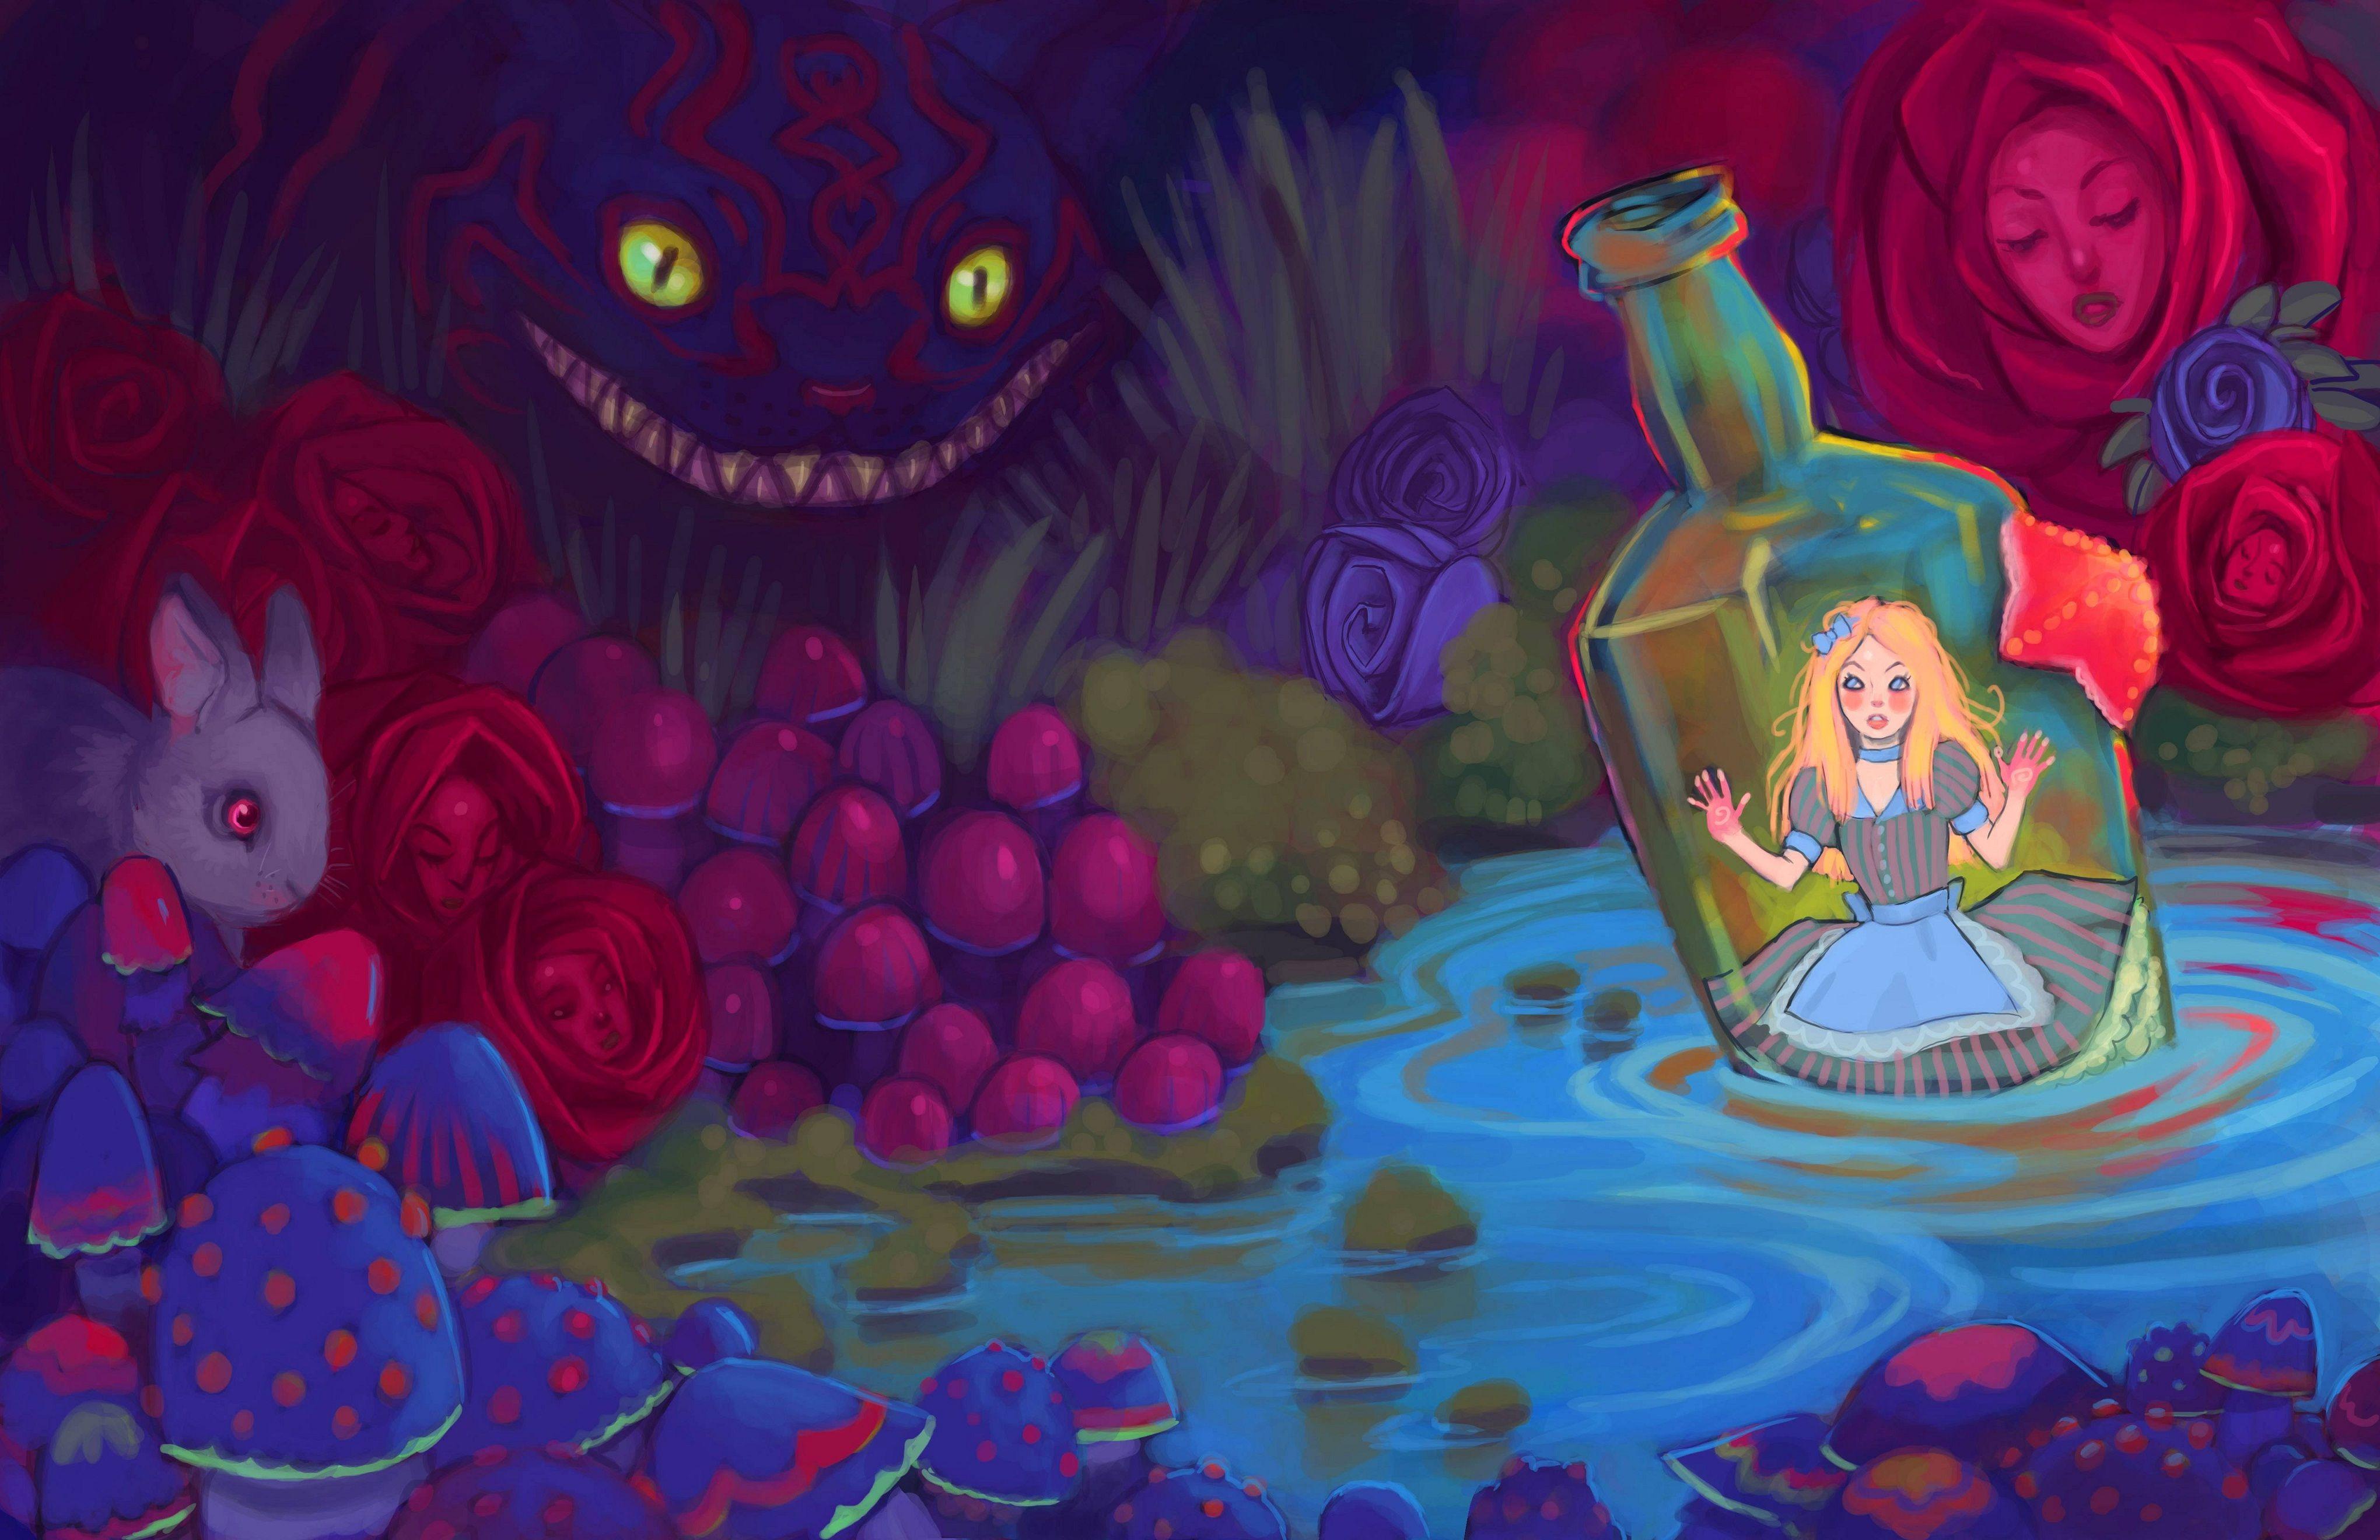 Alice In Wonderland Trippy Wallpapers Top Free Alice In